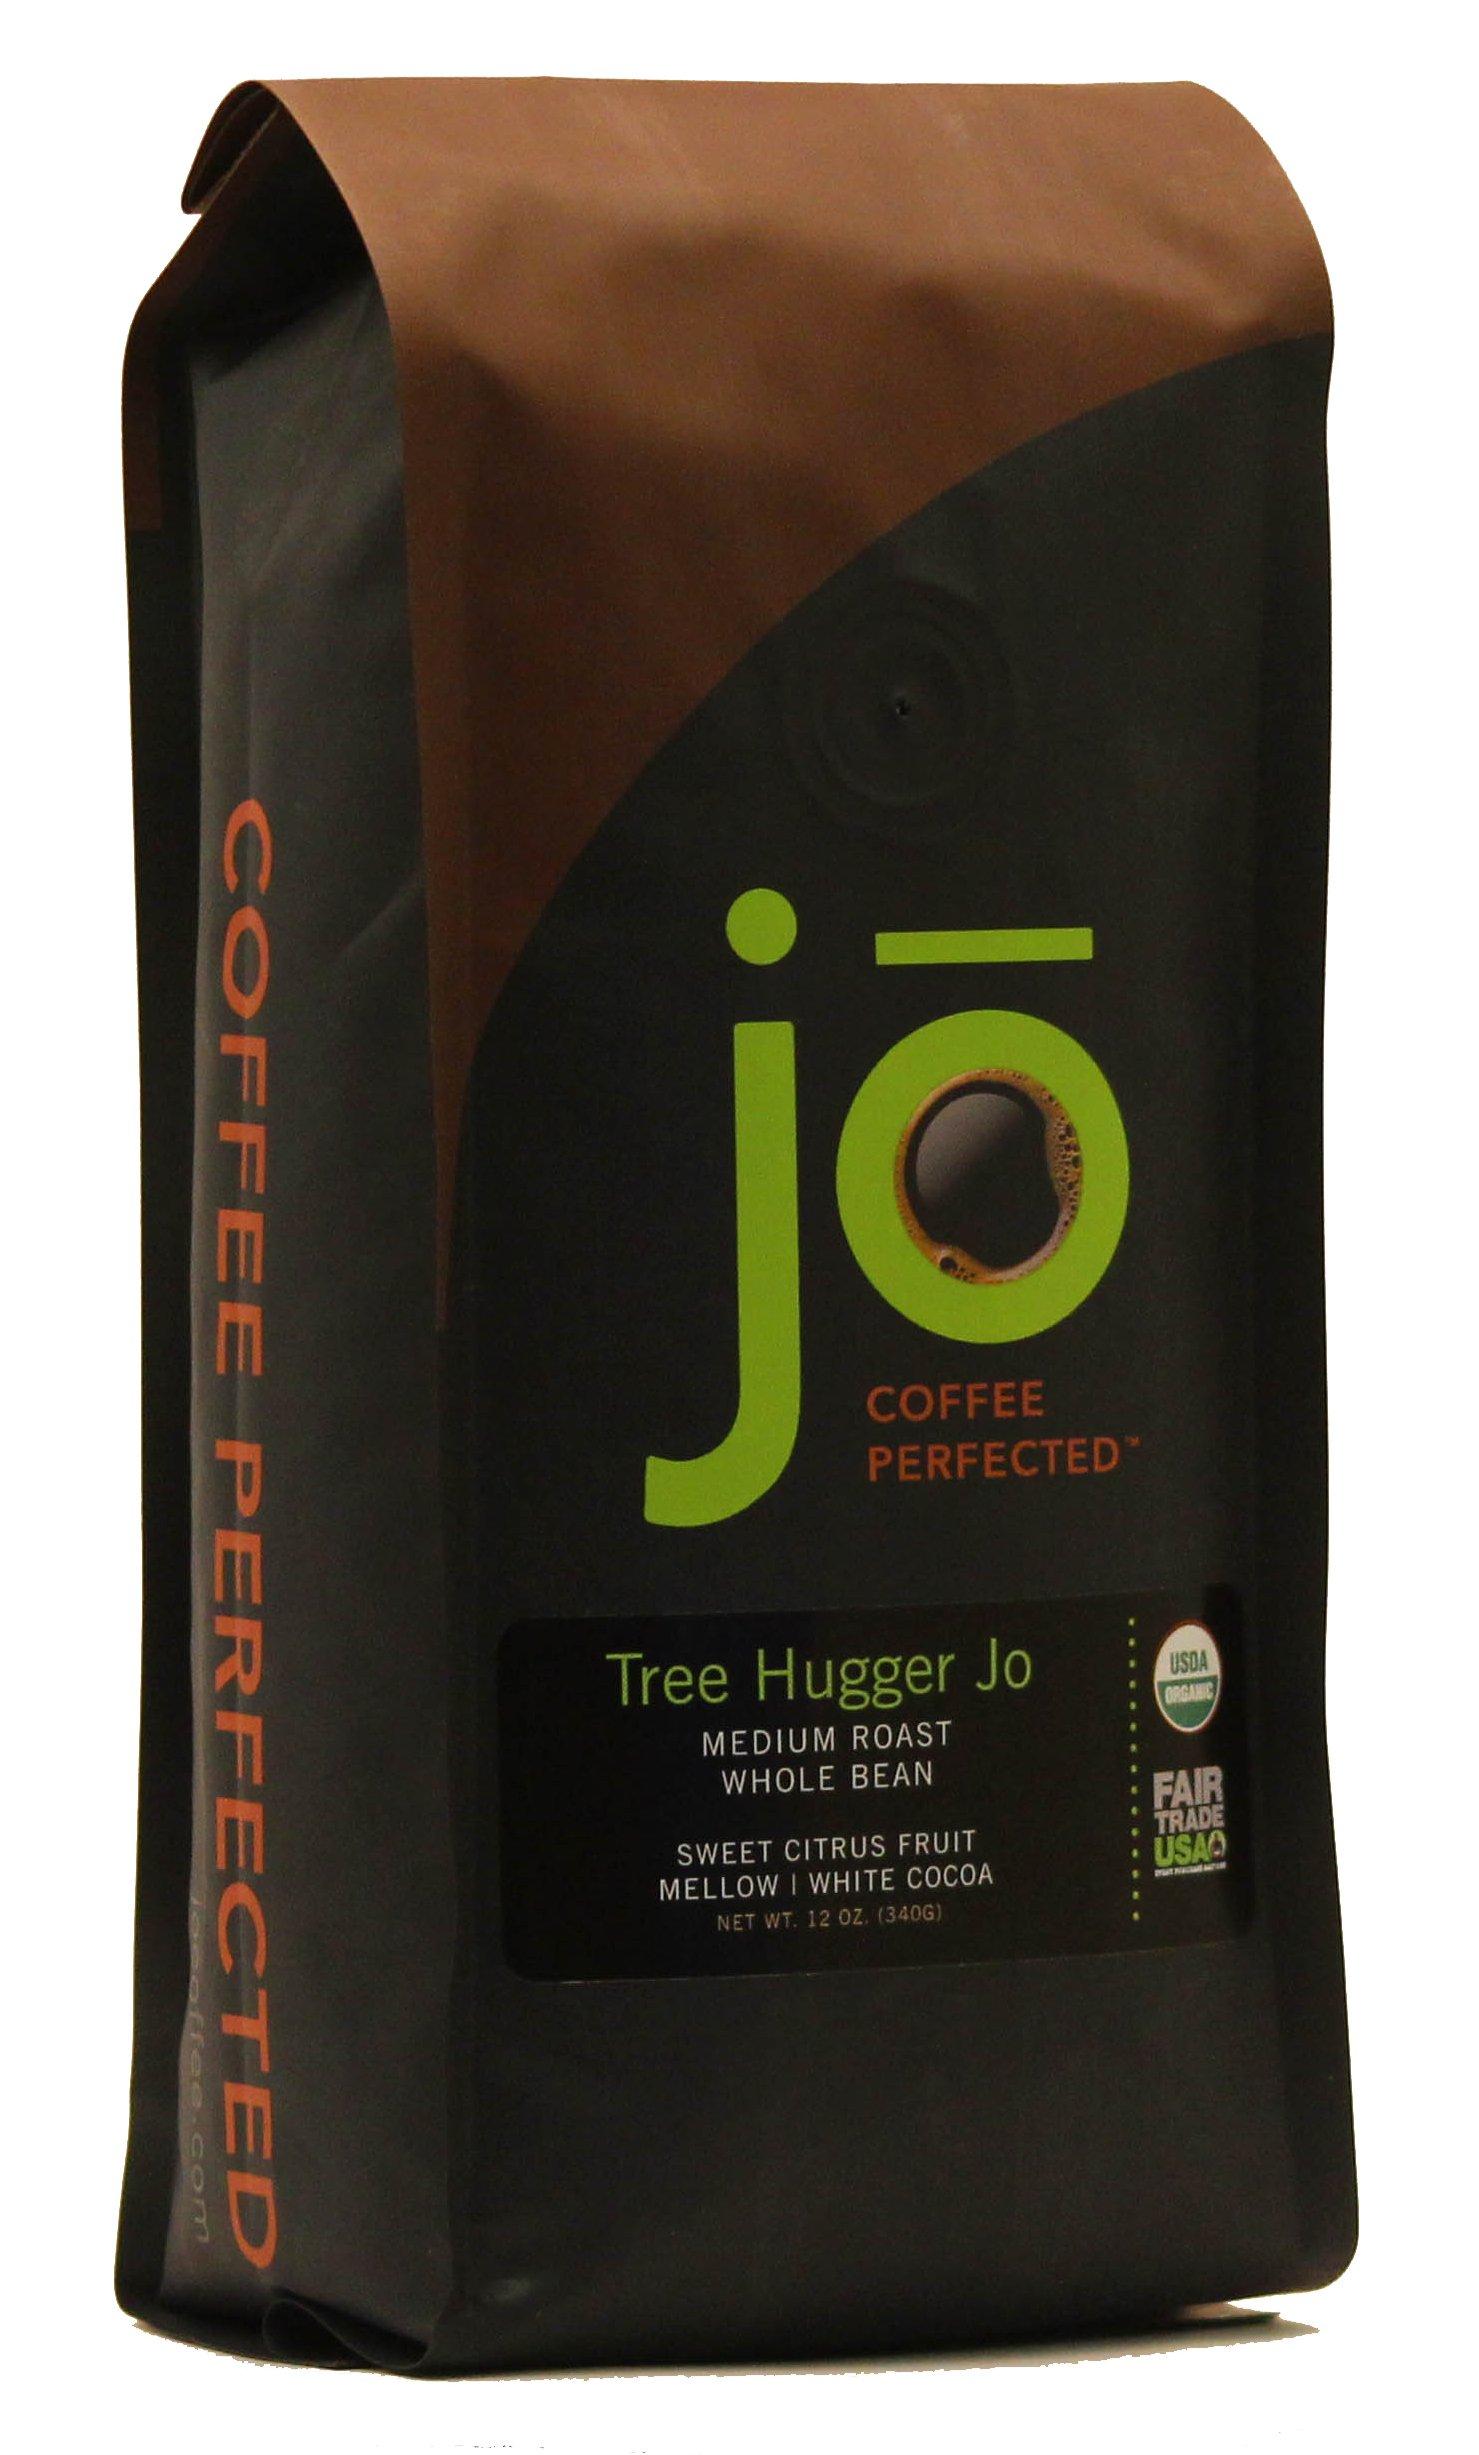 TREE HUGGER JO: 12 oz, Organic Central American Rainforest Whole Bean Coffee, Fair Trade Certified, Medium Roast, USDA Certified Organic, 100% Arabica Coffee, NON-GMO